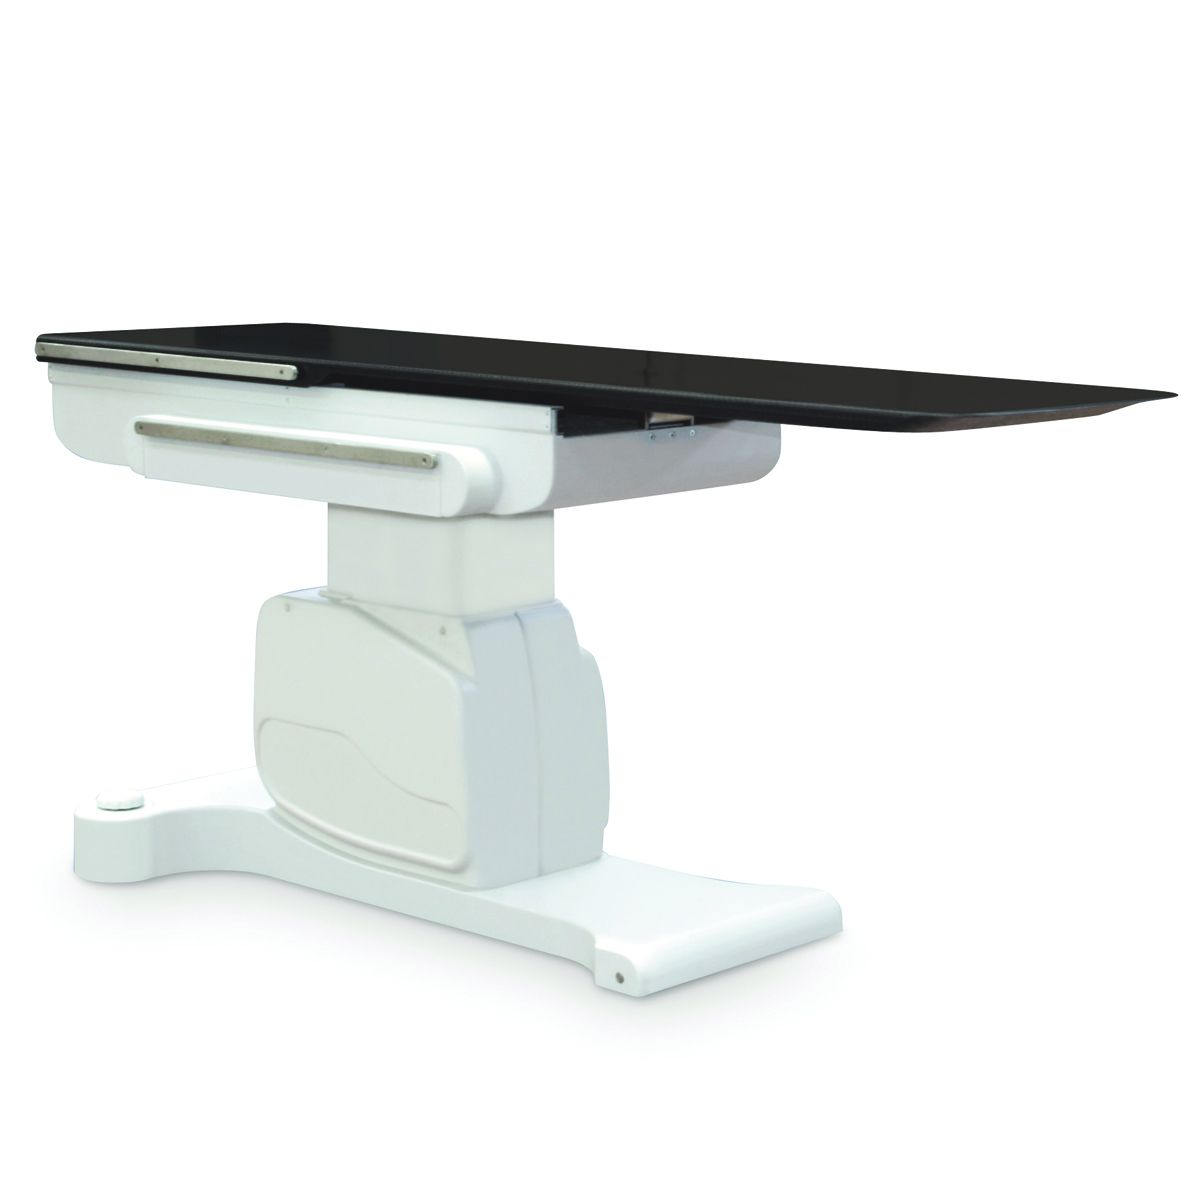 Angio-Table